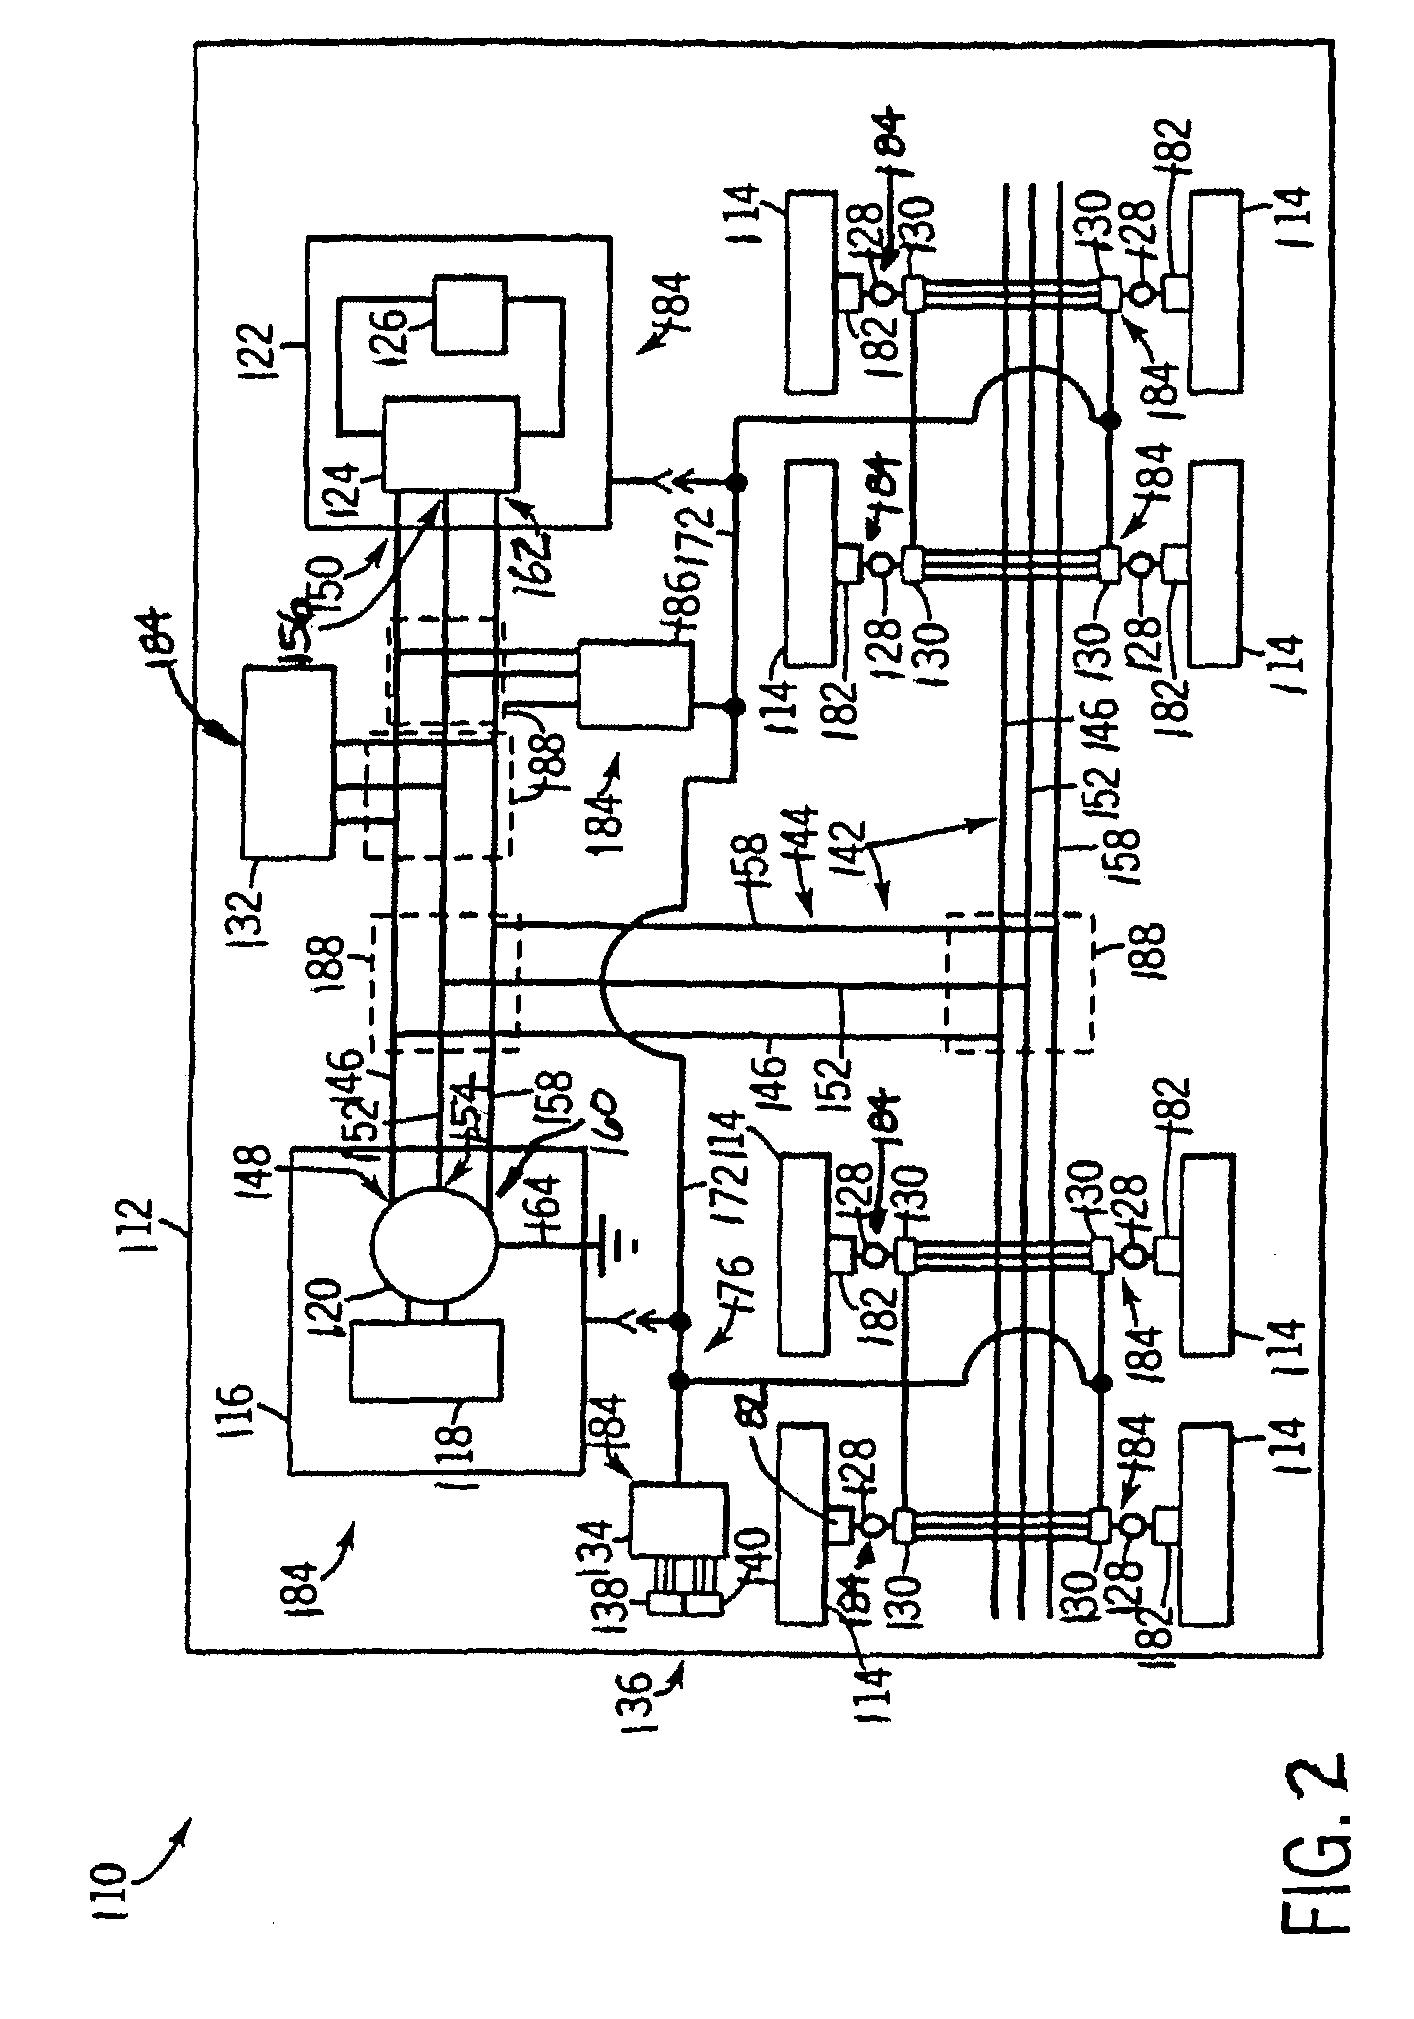 gem cart wiring diagram 2001 gem car wiring diagram e1 wiring diagram  2001 gem car wiring diagram e1 wiring